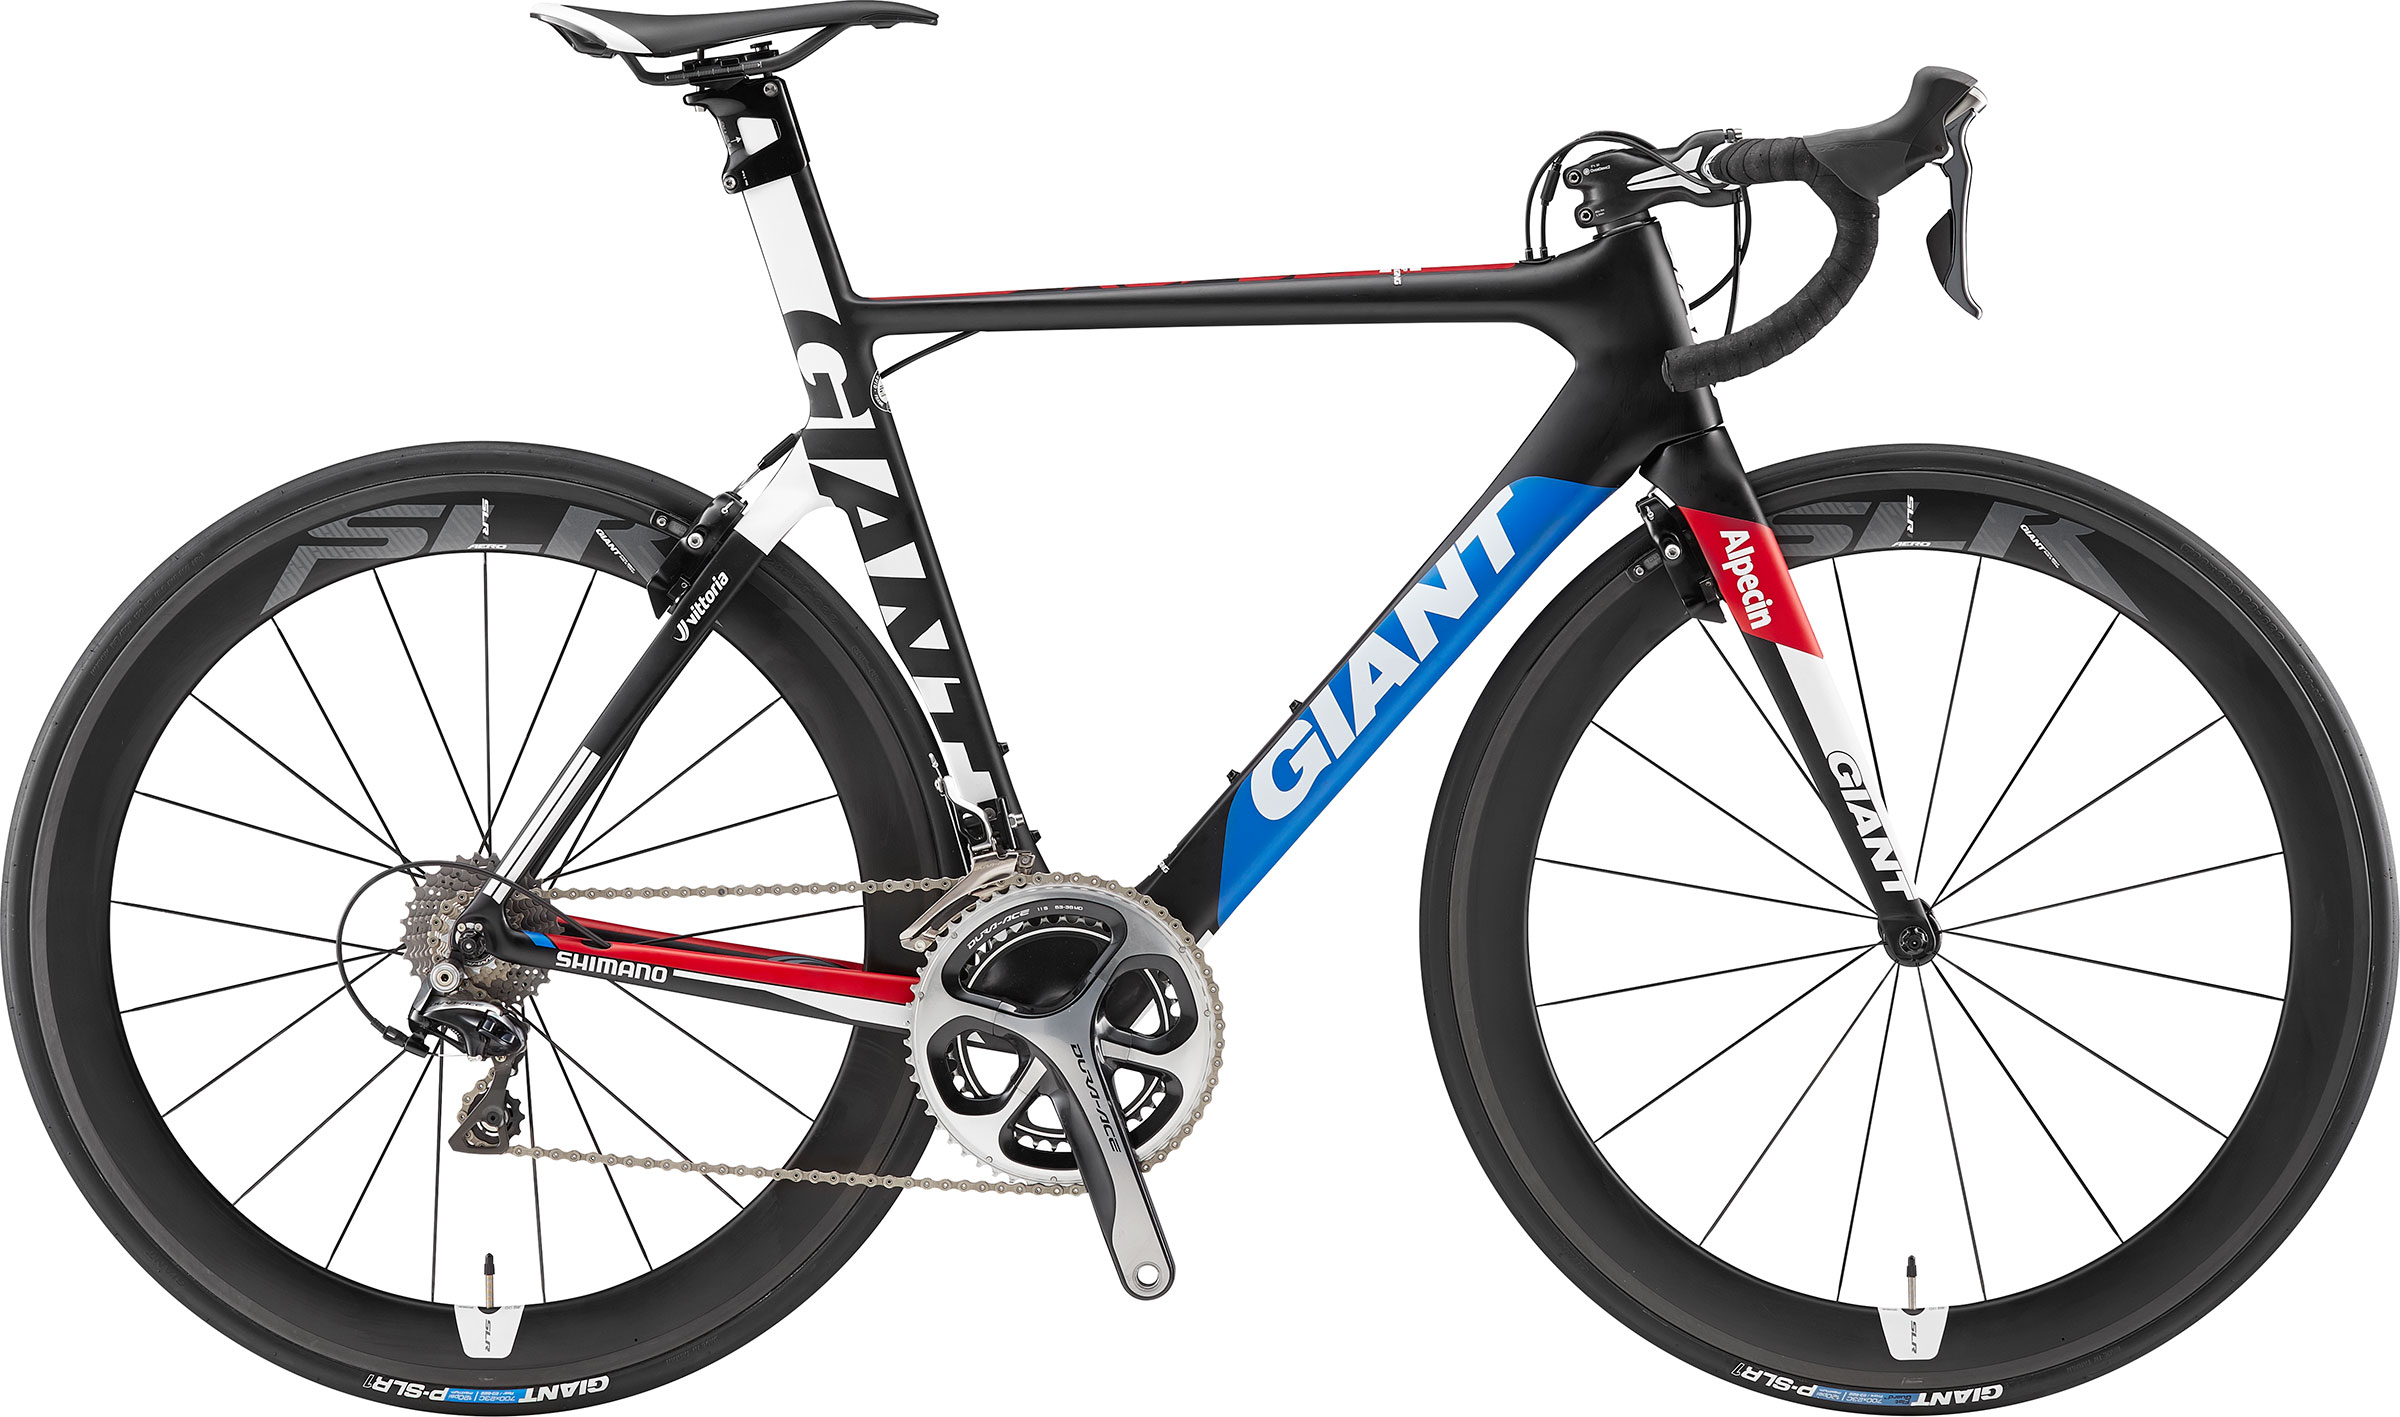 ab5916f33d6 Giant Propel Advanced SL 1 Team - The Newbury Park Bicycle Shop